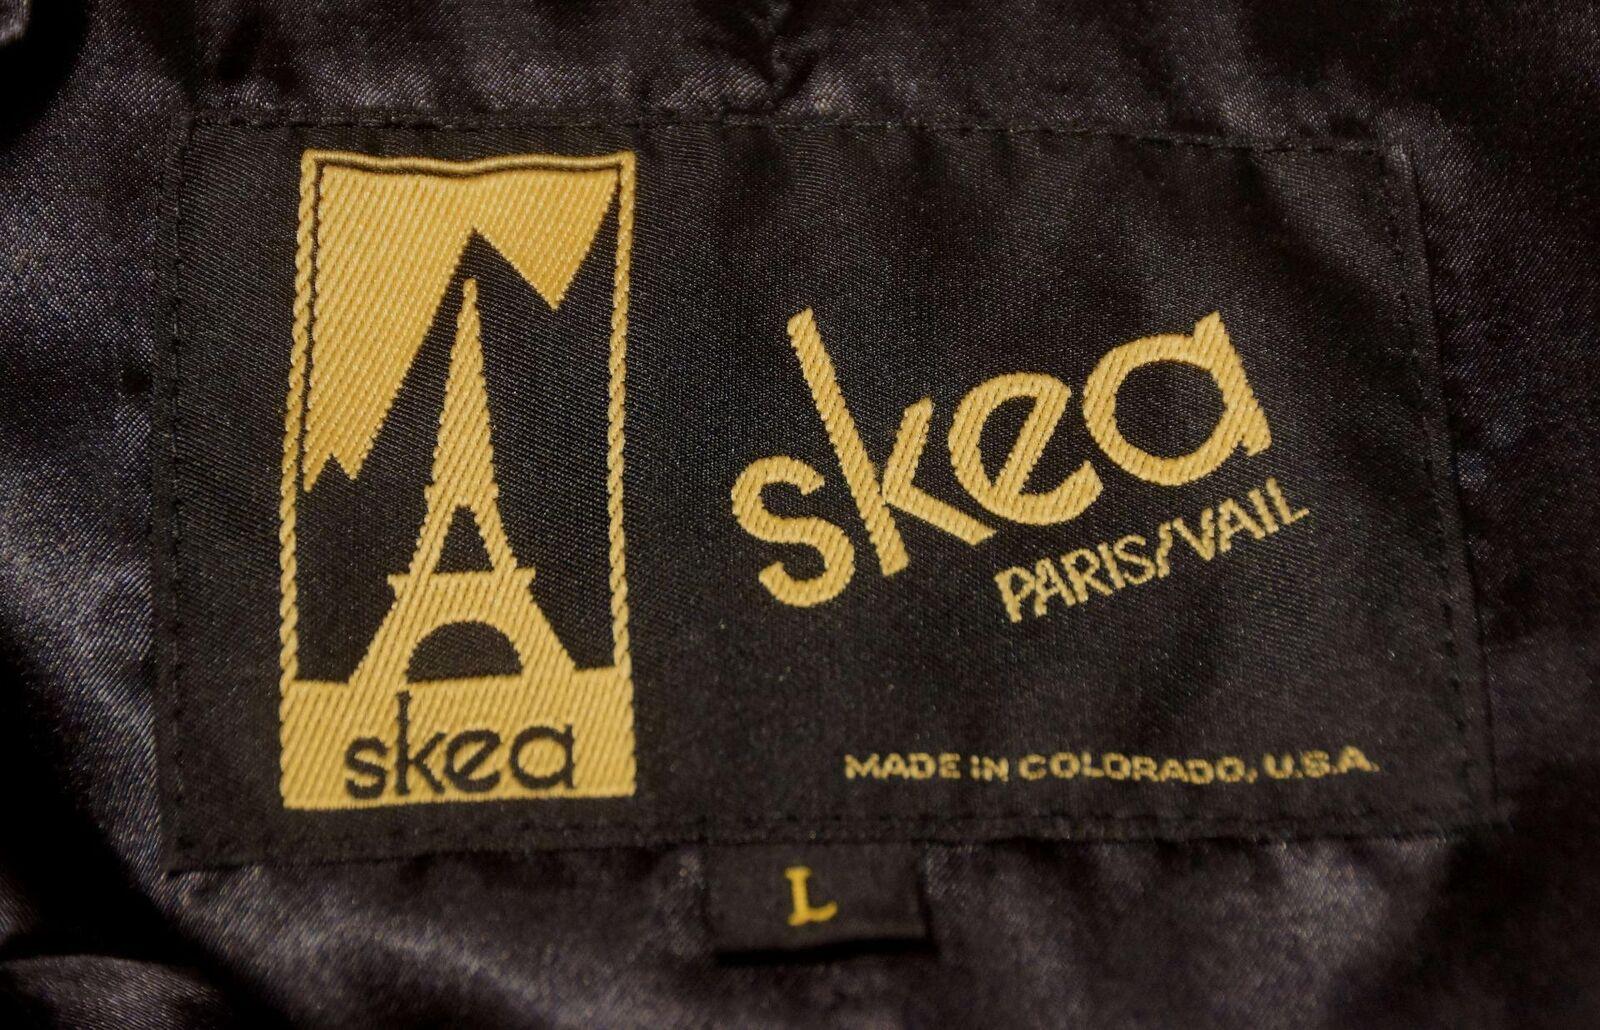 Nice Multi-colord ORange Based Floral SKEA Vest Made in colorado colorado colorado Sz L 0a5102